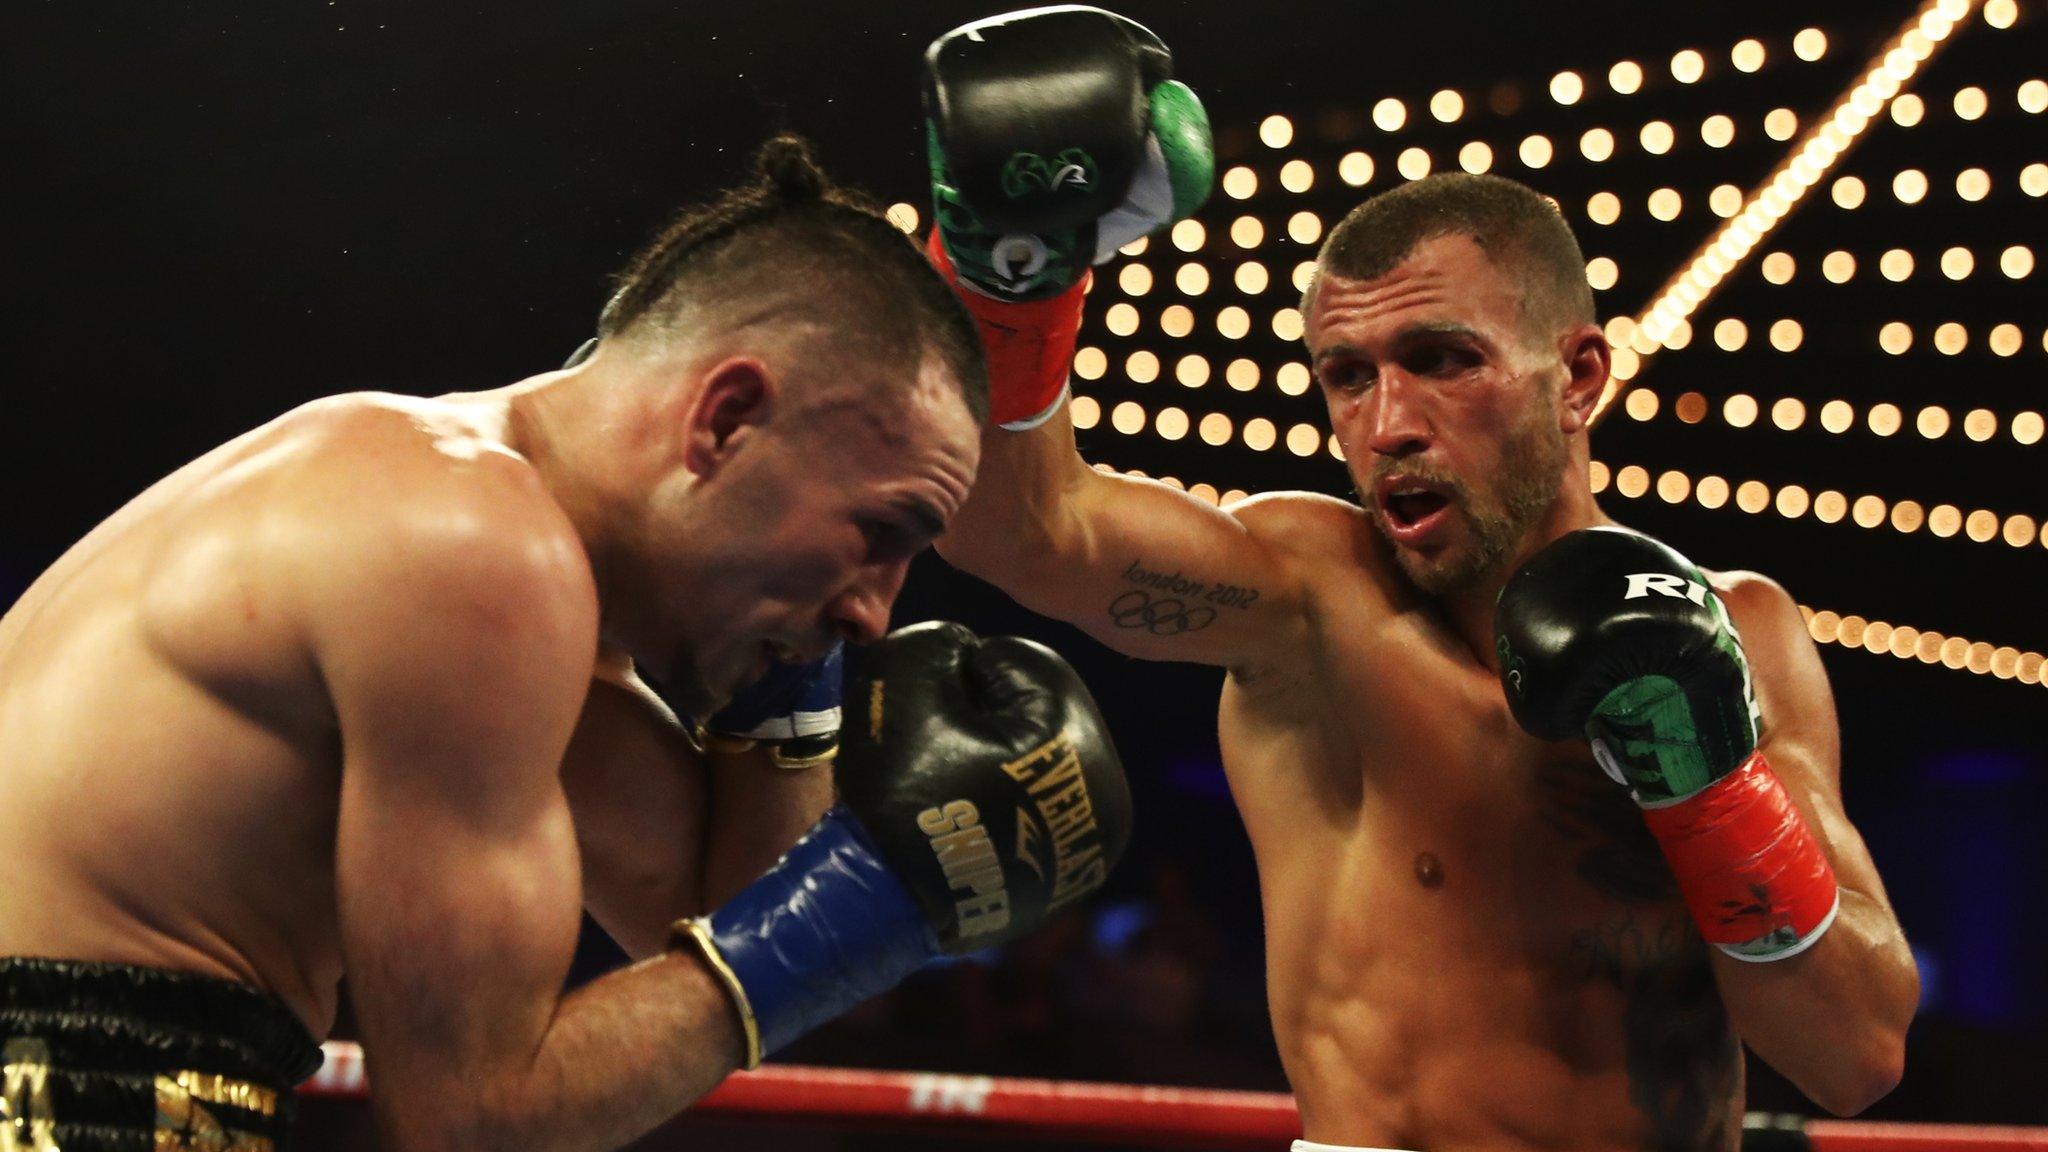 Vasyl Lomachenko beats Jose Pedraza as Isaac Dogboe loses belt to Emanuel Navarrete